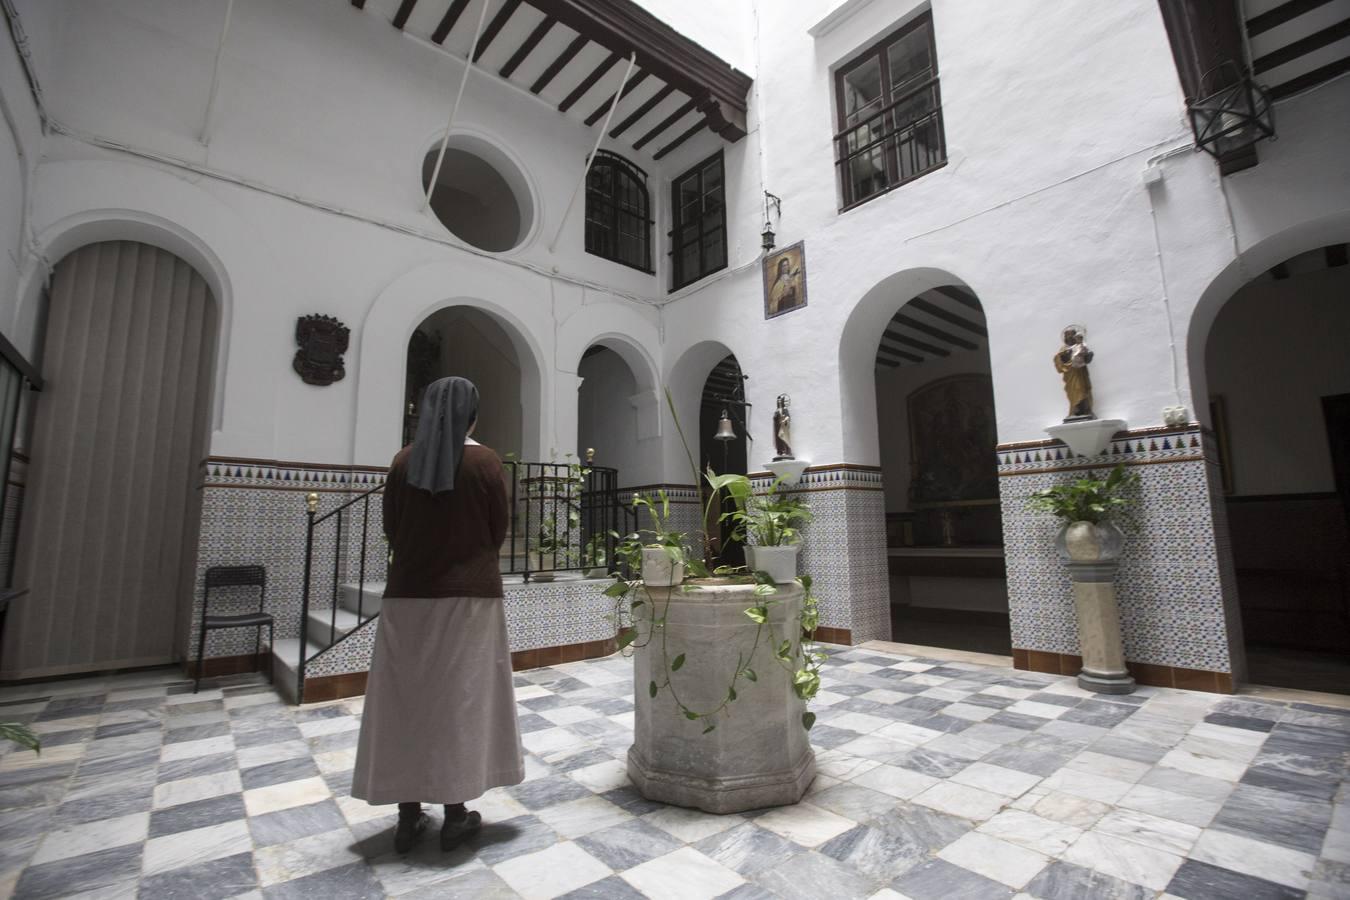 Patio de las Carmelitas Descalzas